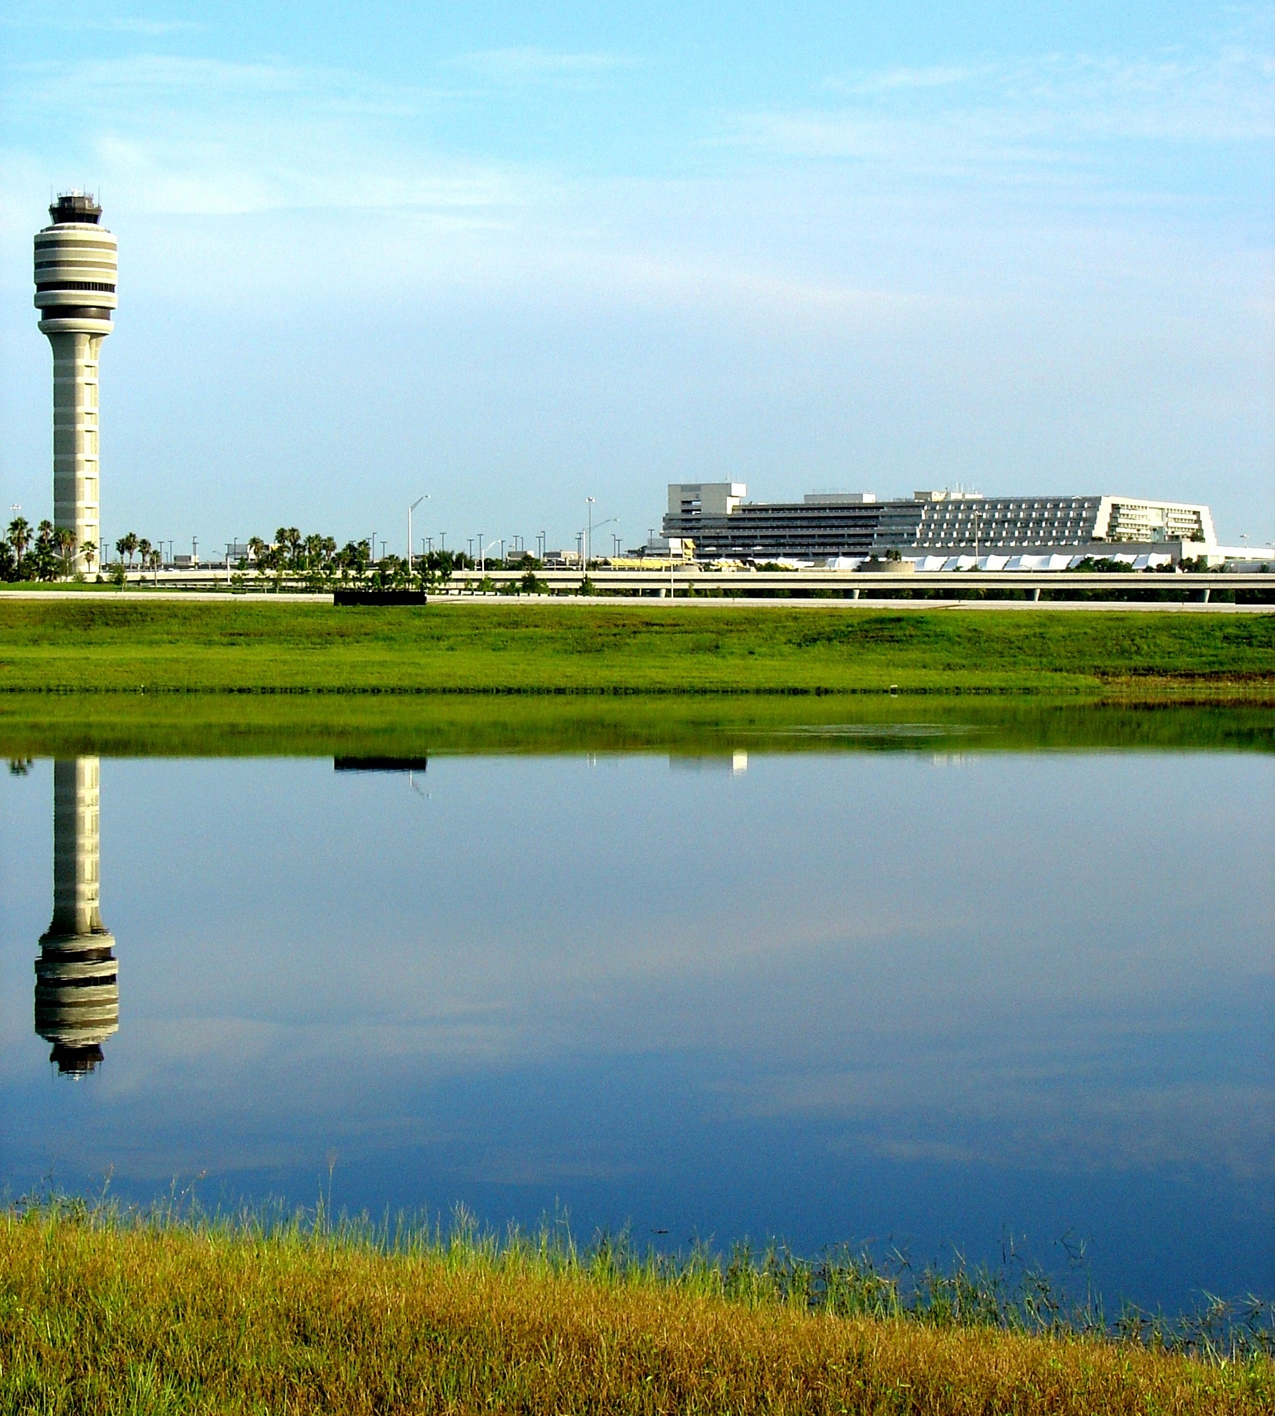 FAA Tower/Terminal Reflected